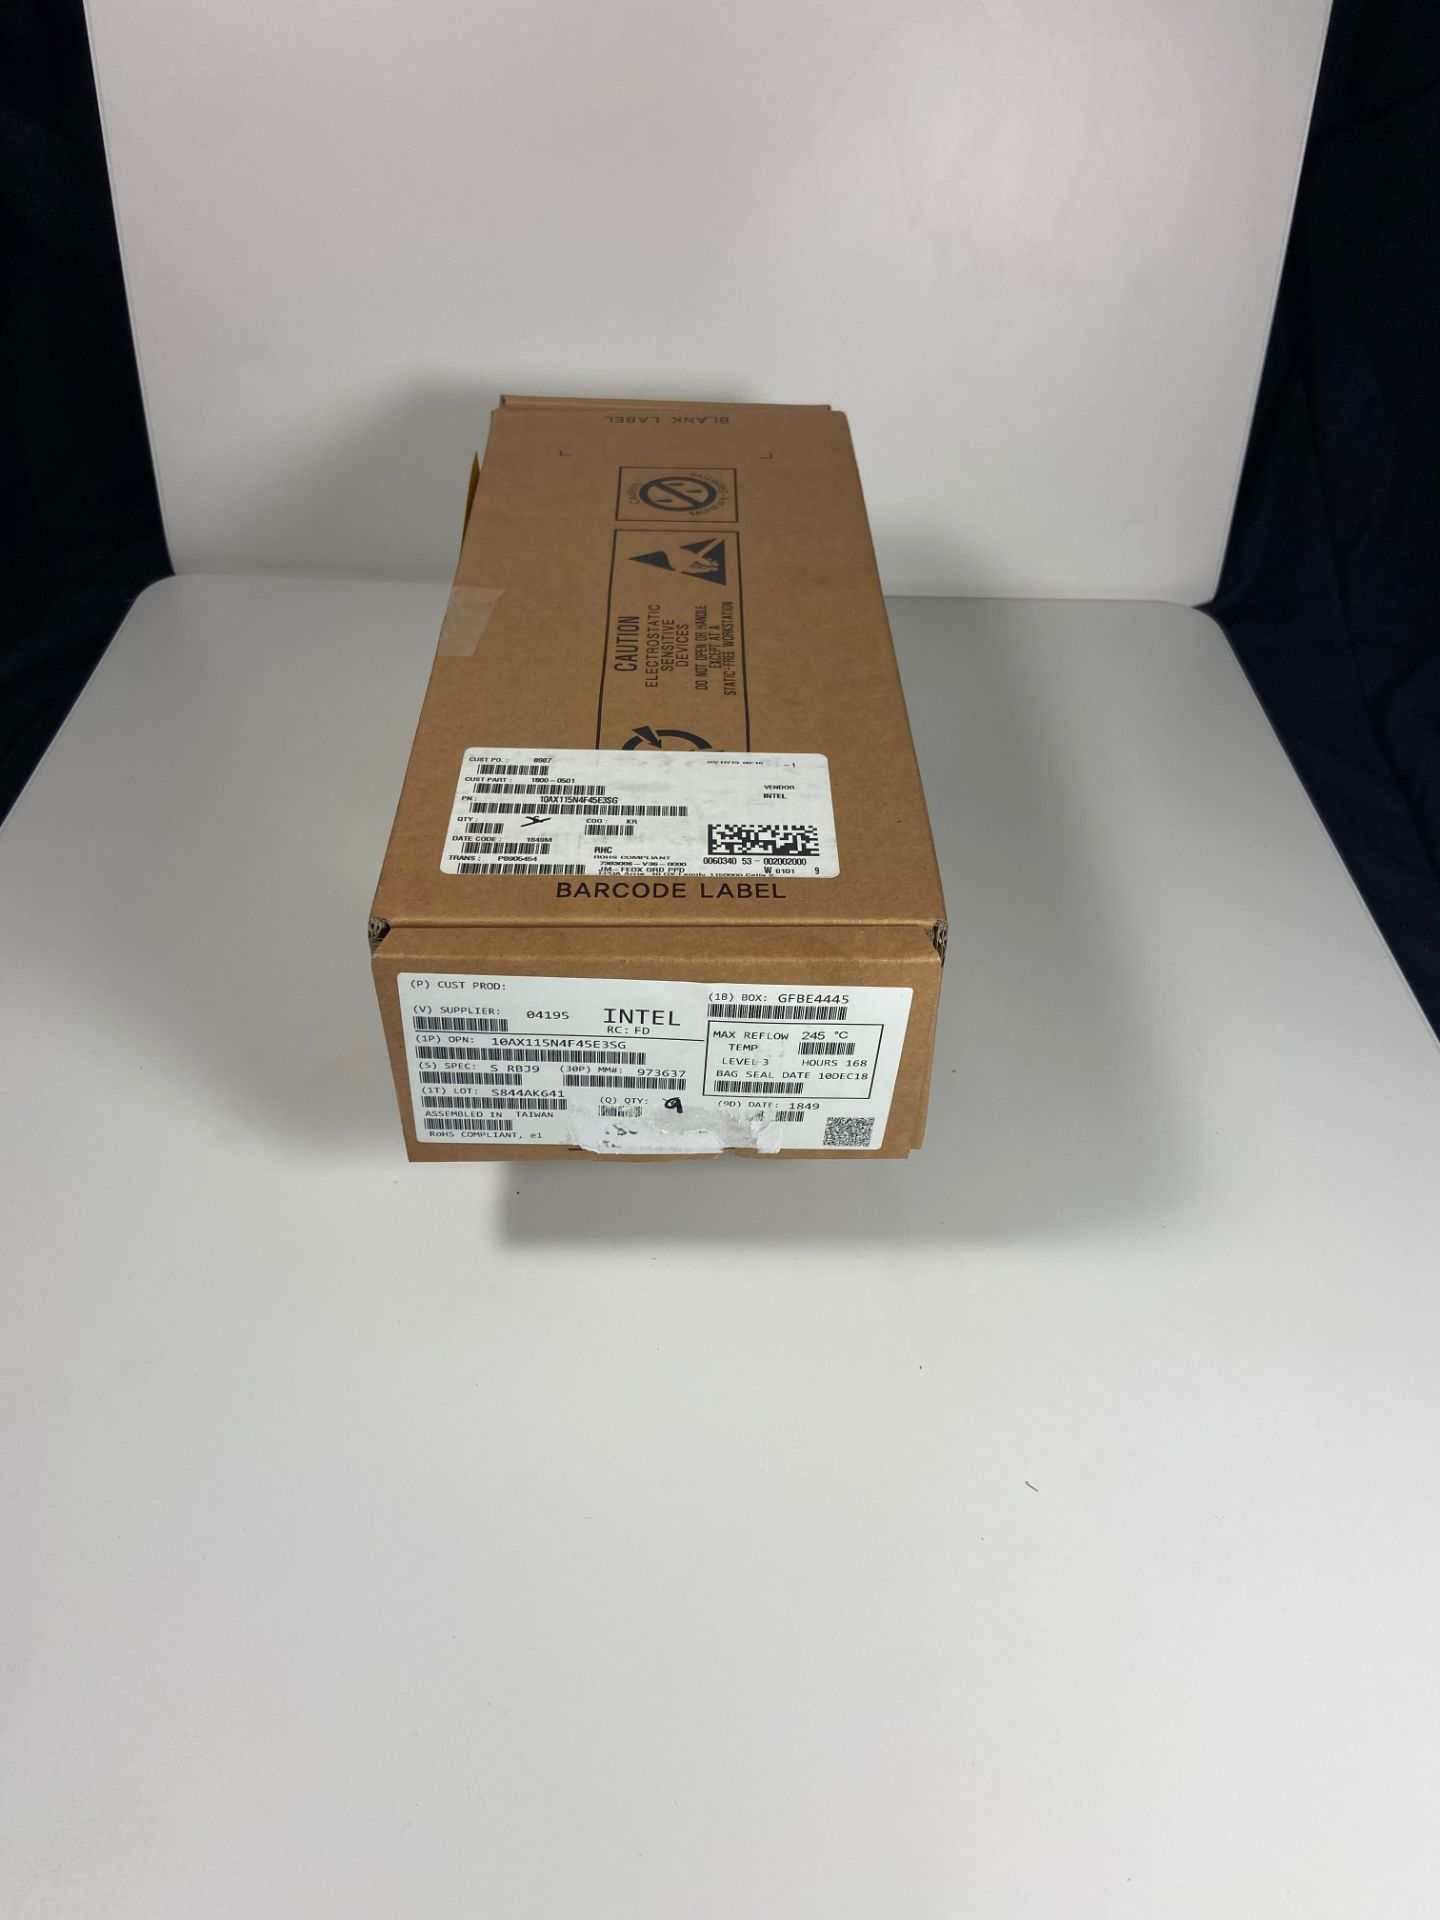 Intel 10AX115N4F45E3SG, QTY 9, FPGA Arria 10 GX Family 1150000 Cells 20nm Technology 0.9V - Image 2 of 6